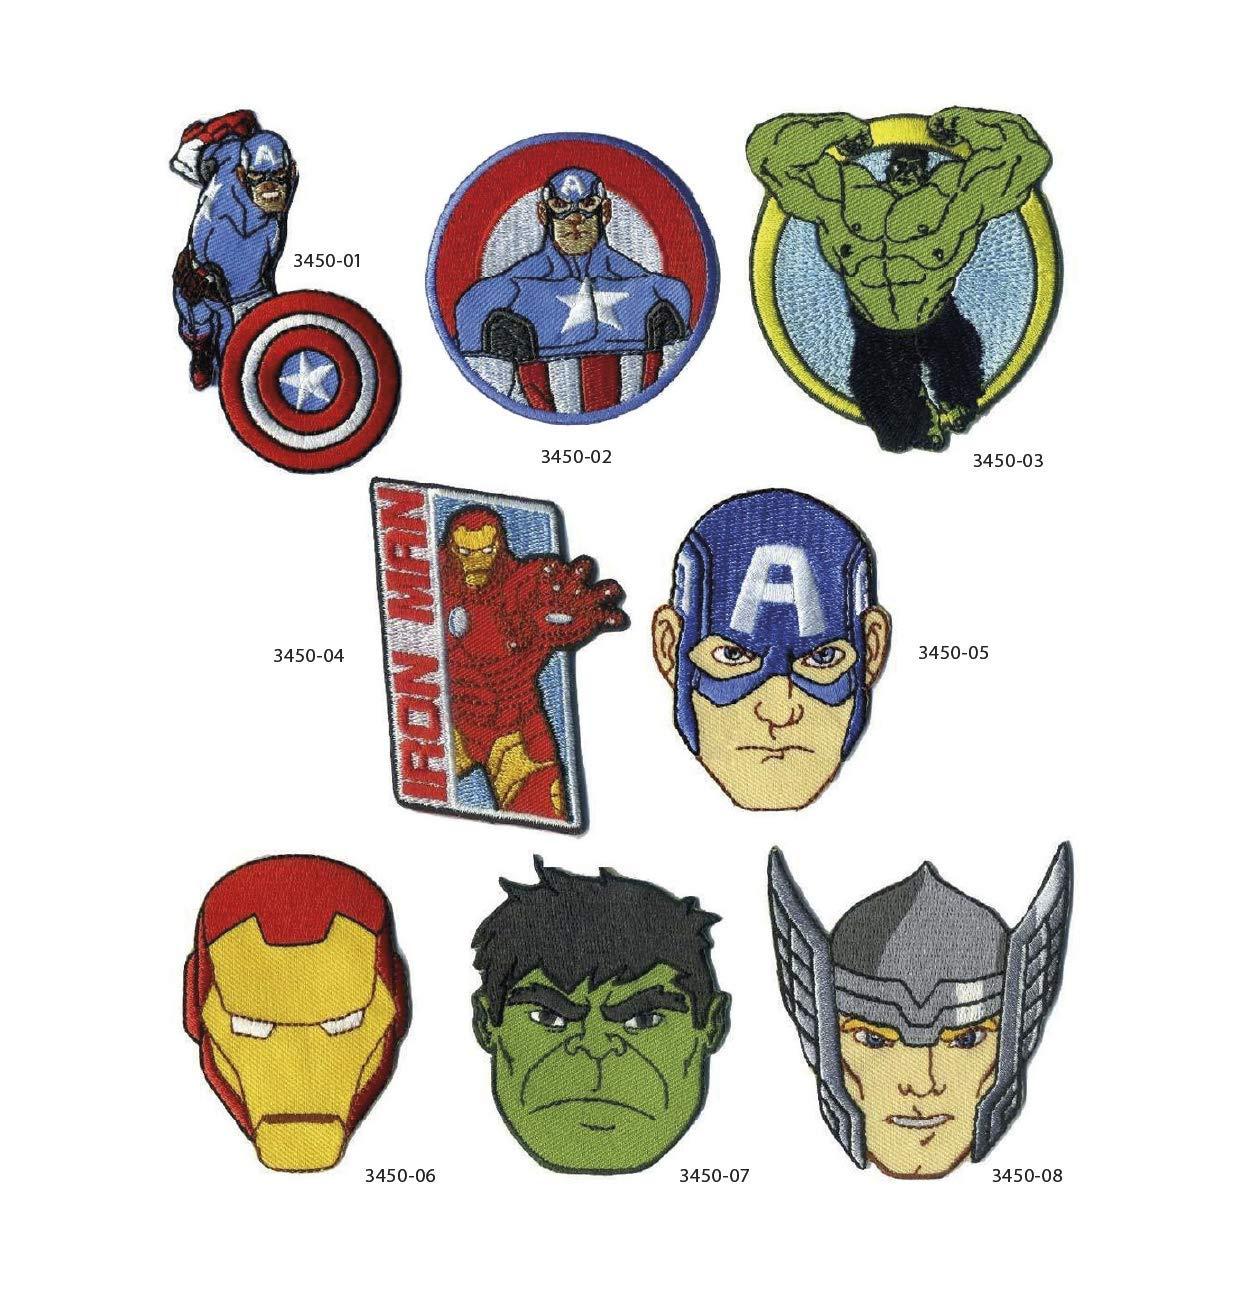 8 parches the avengers bordados para planchar REF.3450-U8